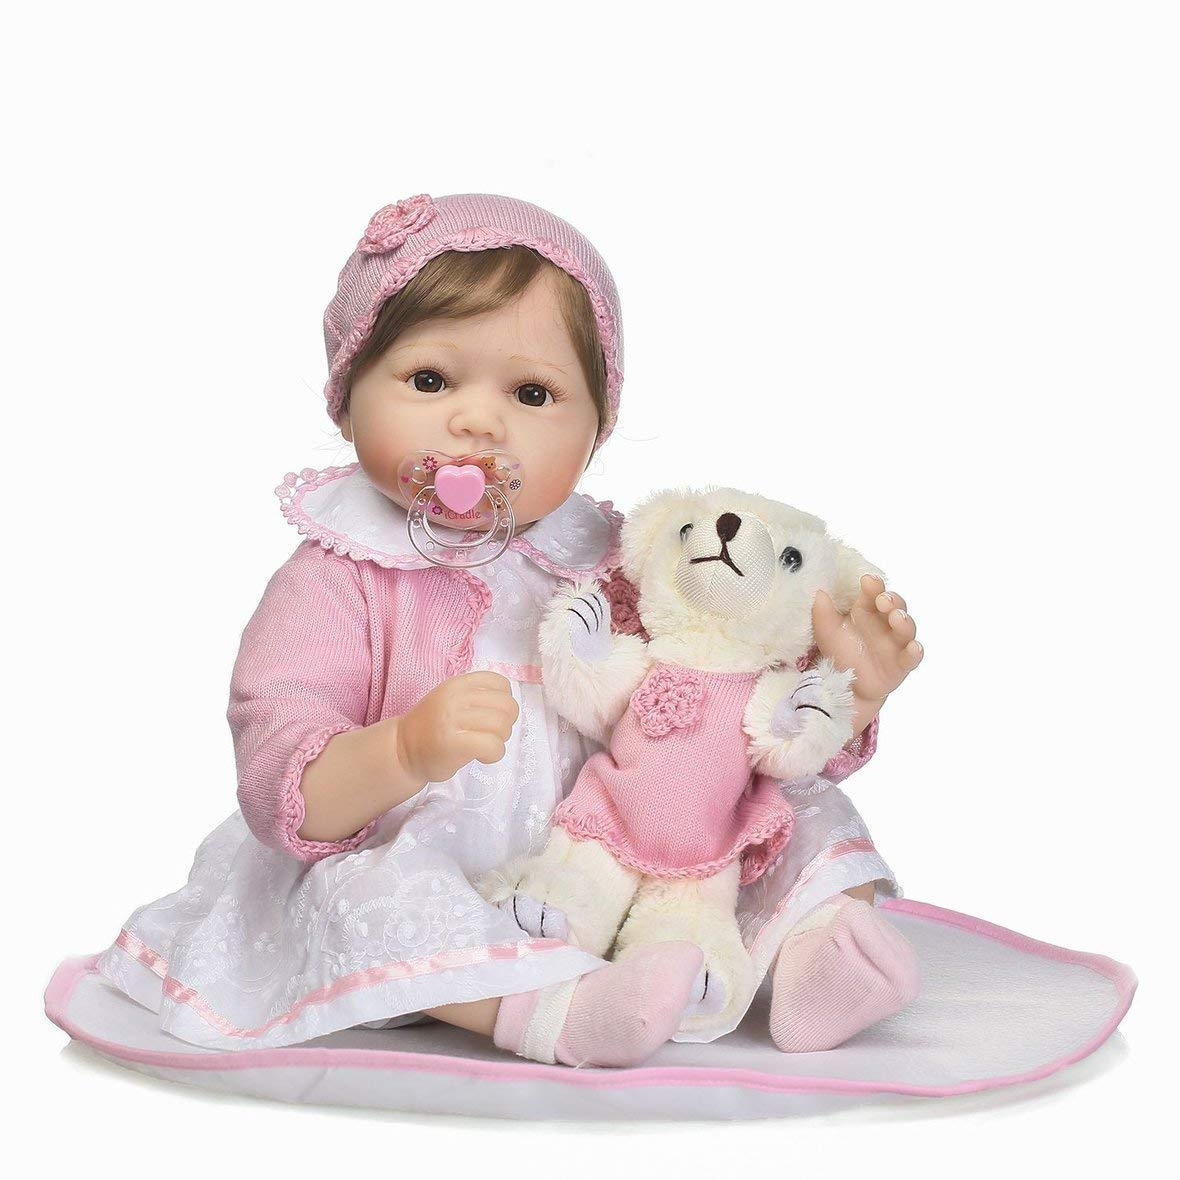 Moreaulun 21.65inch Kids Reborn Baby Doll Silicona Realista Newborn Doll Girl Touch Soft